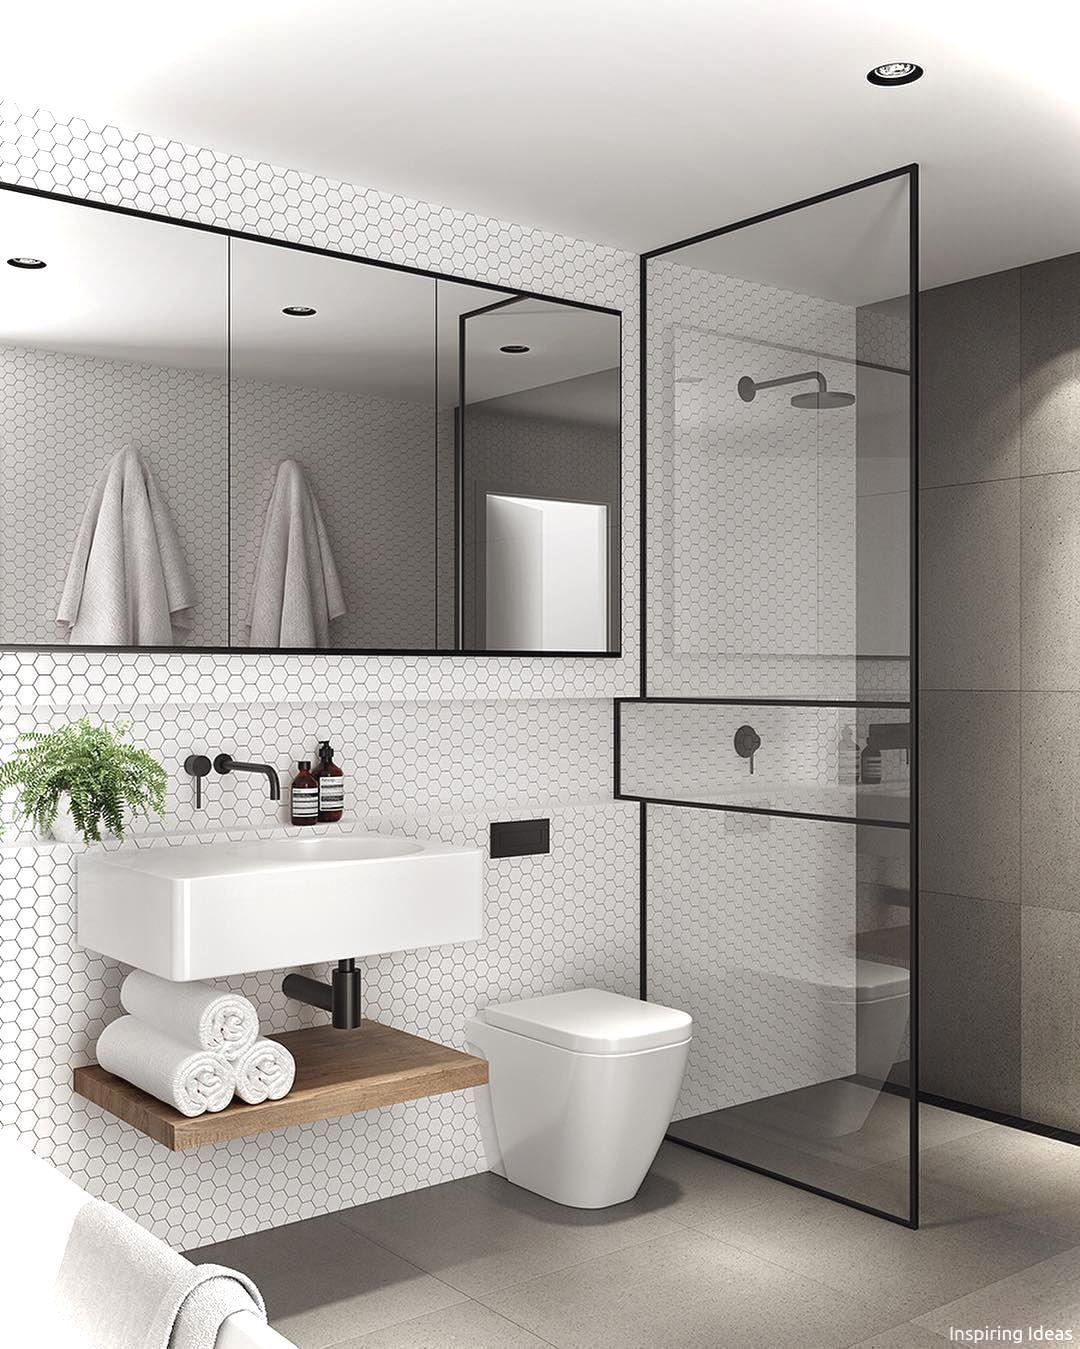 99+ Luxury Black and White Bathroom Ideas   Black white bathrooms ...